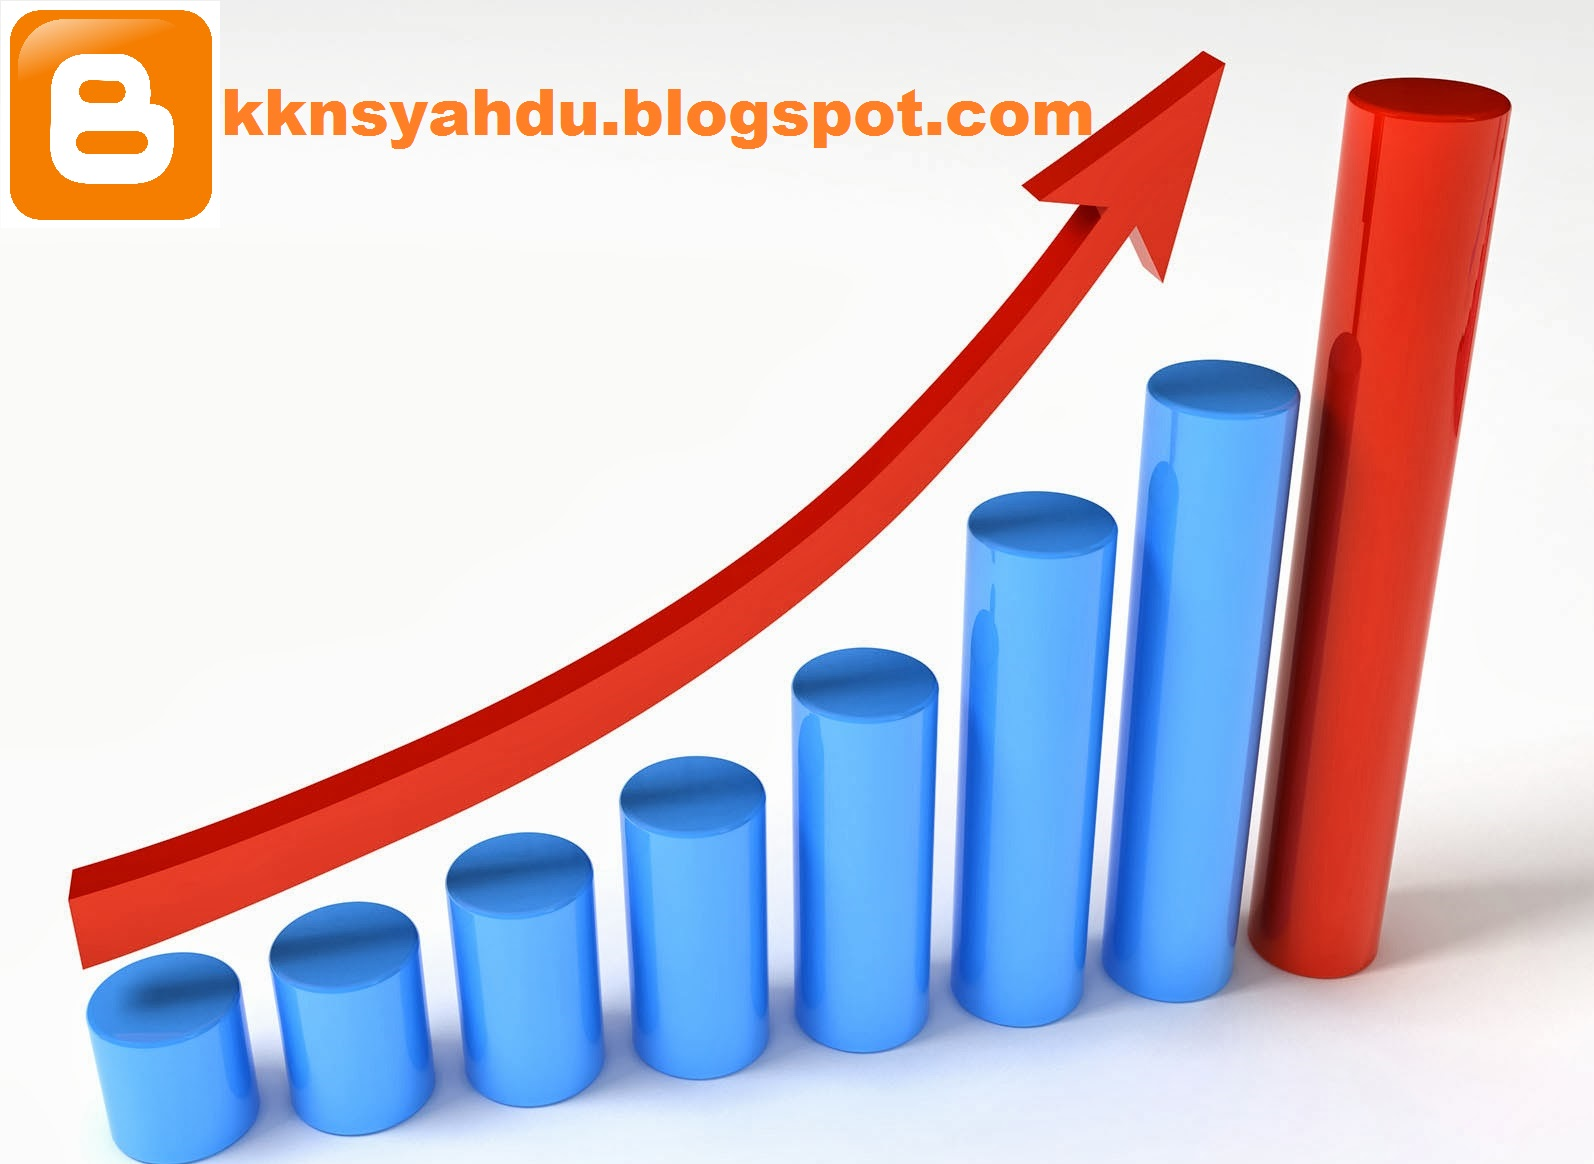 Cara Agar Blog Terkenal Dan Banyak Pengunjung